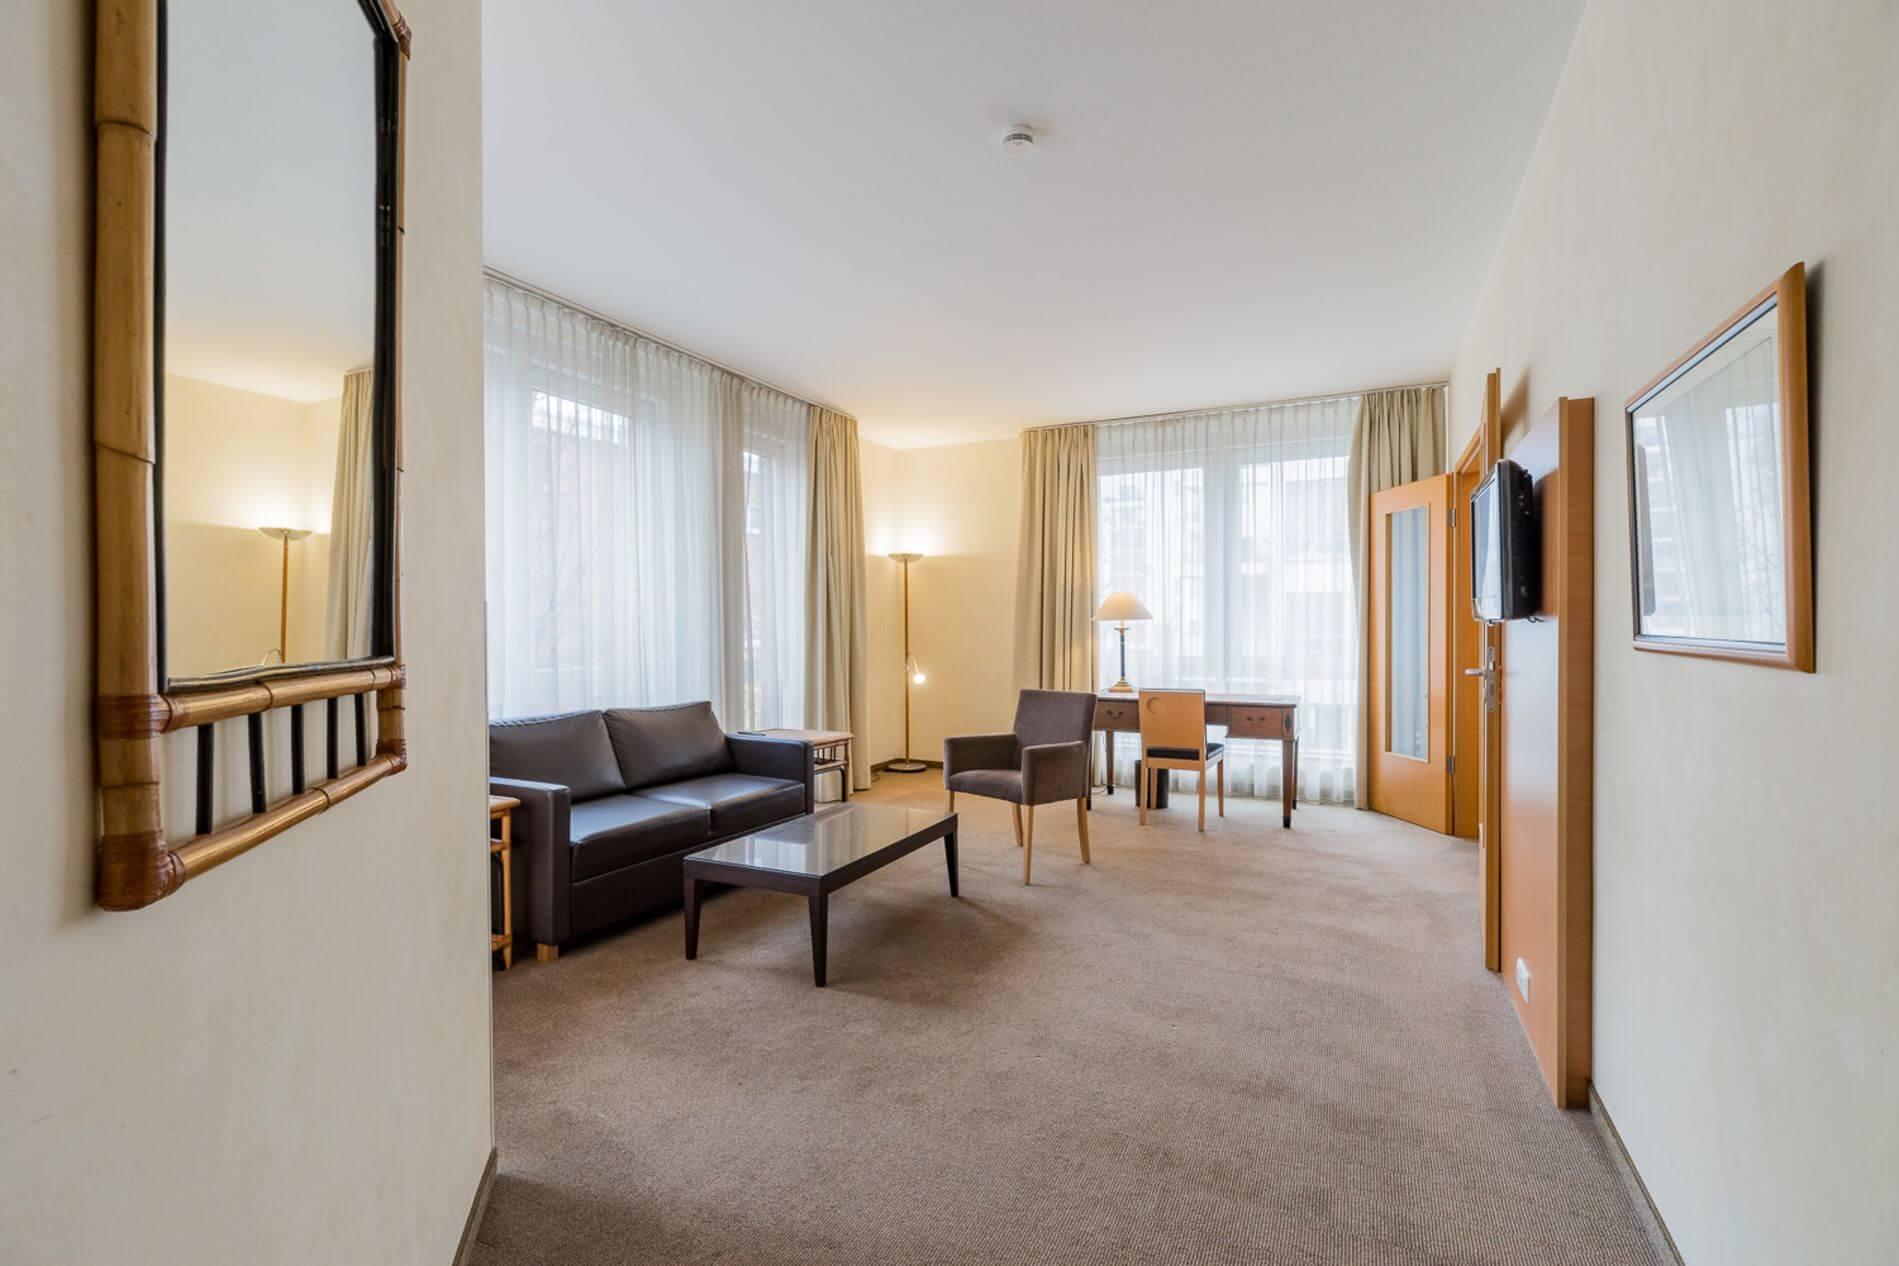 Furnished 2 room rental for short stays in Berlin